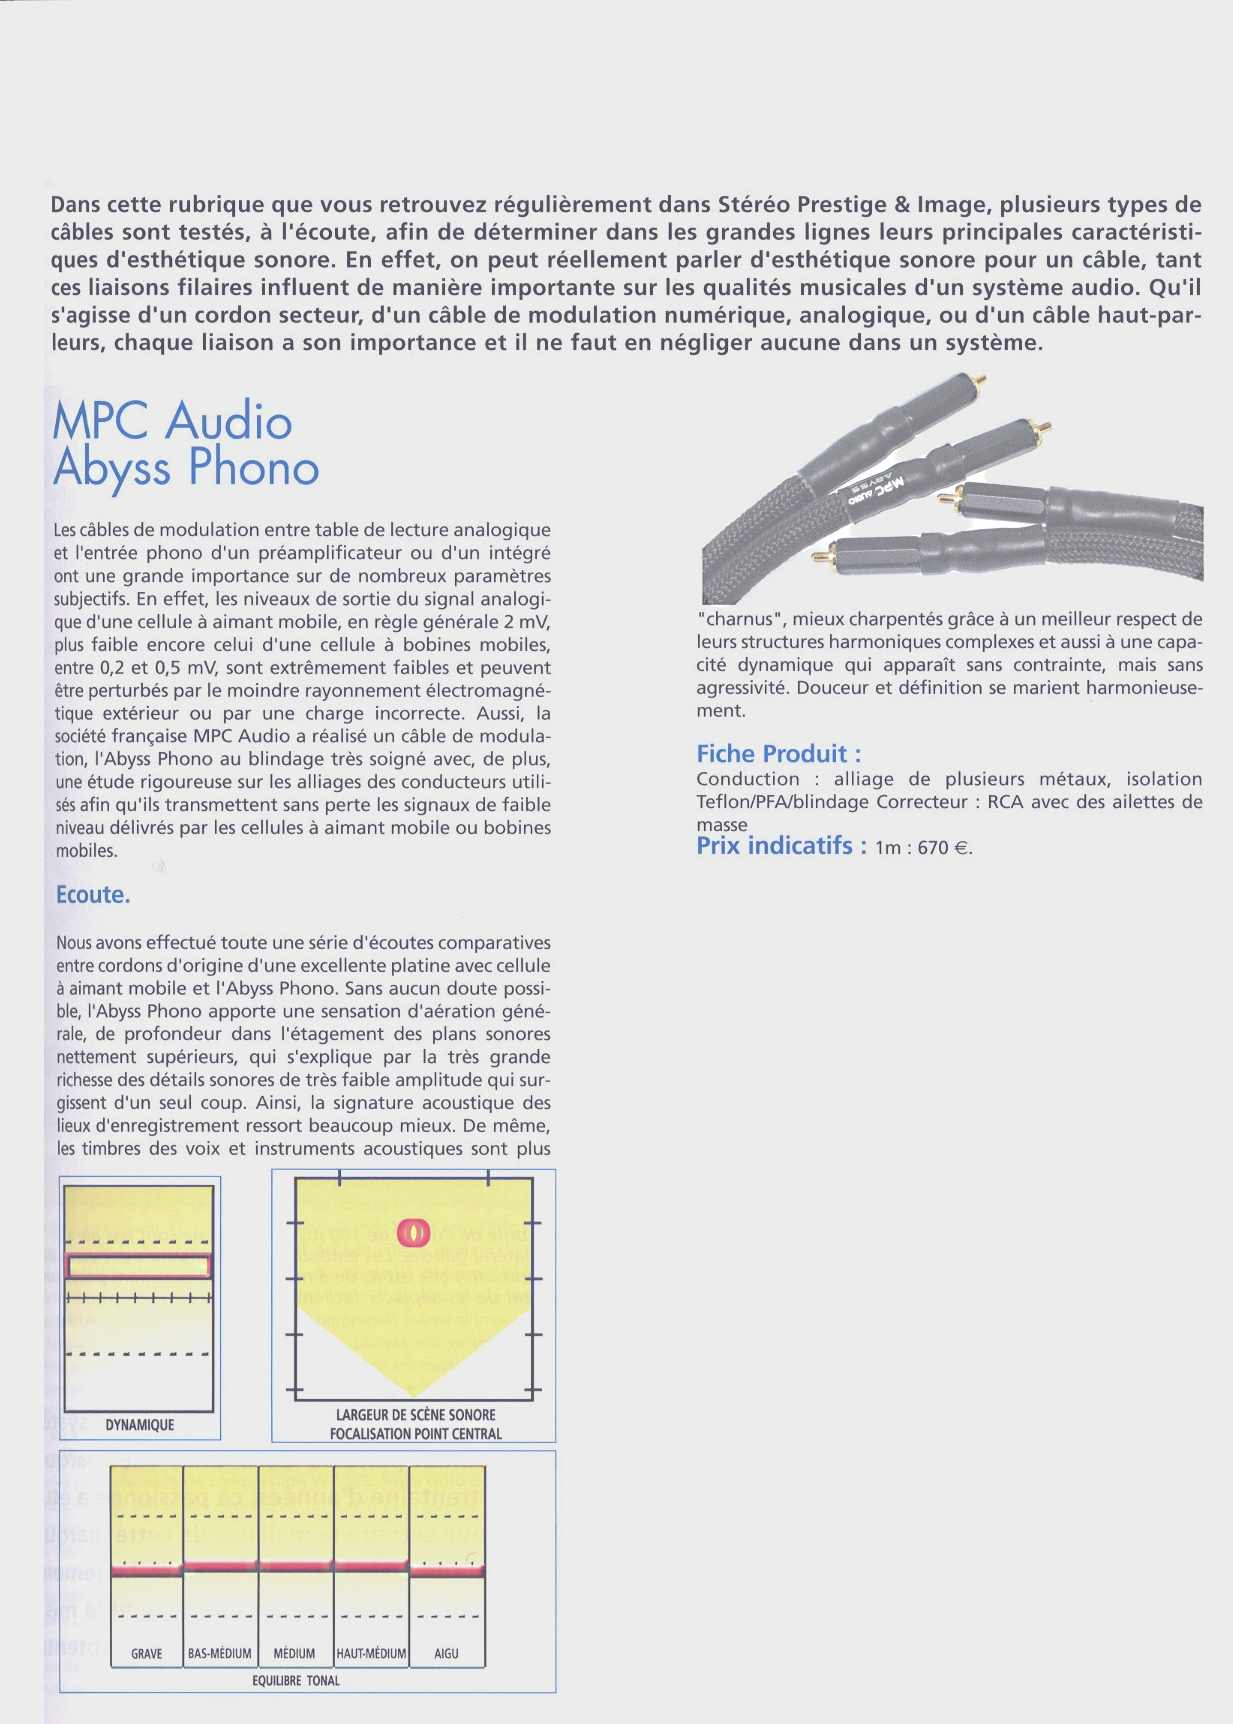 2010 - Test Modulation Abyss Phono Stereo Prestige Octobre 2010